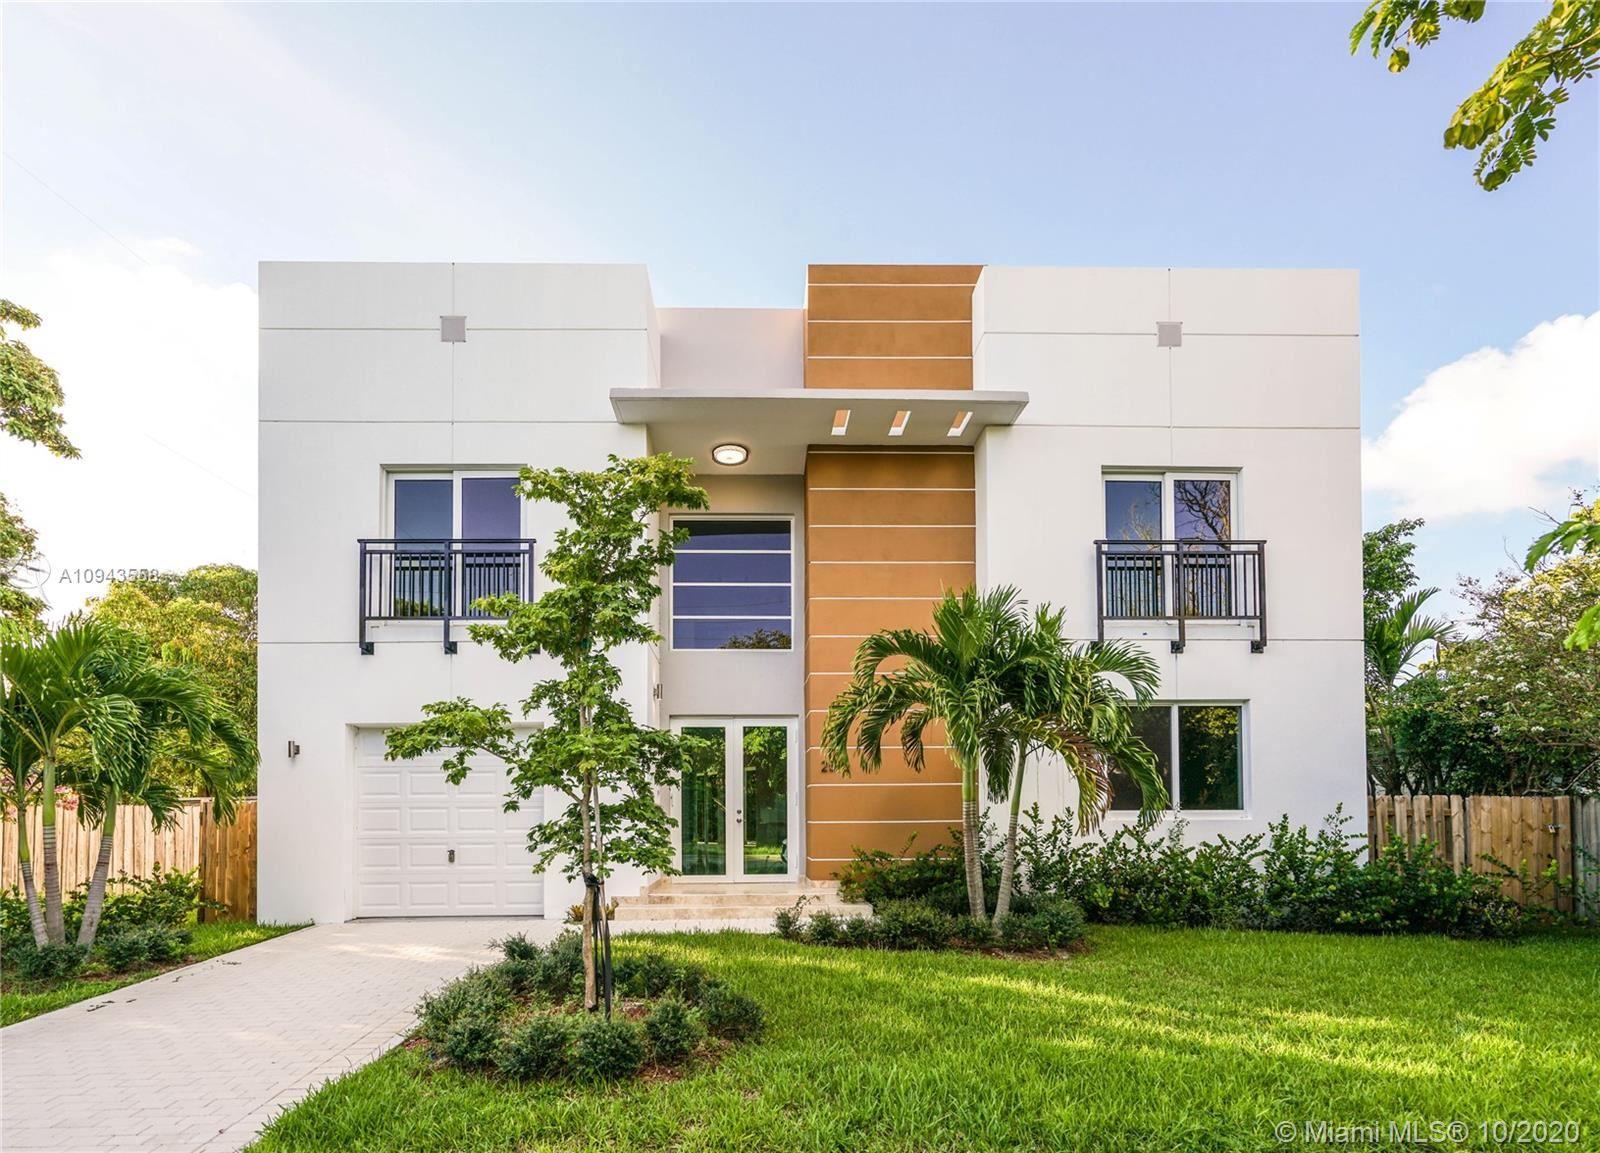 2510 SW 2nd Ave, Miami, FL 33129 - #: A10943558